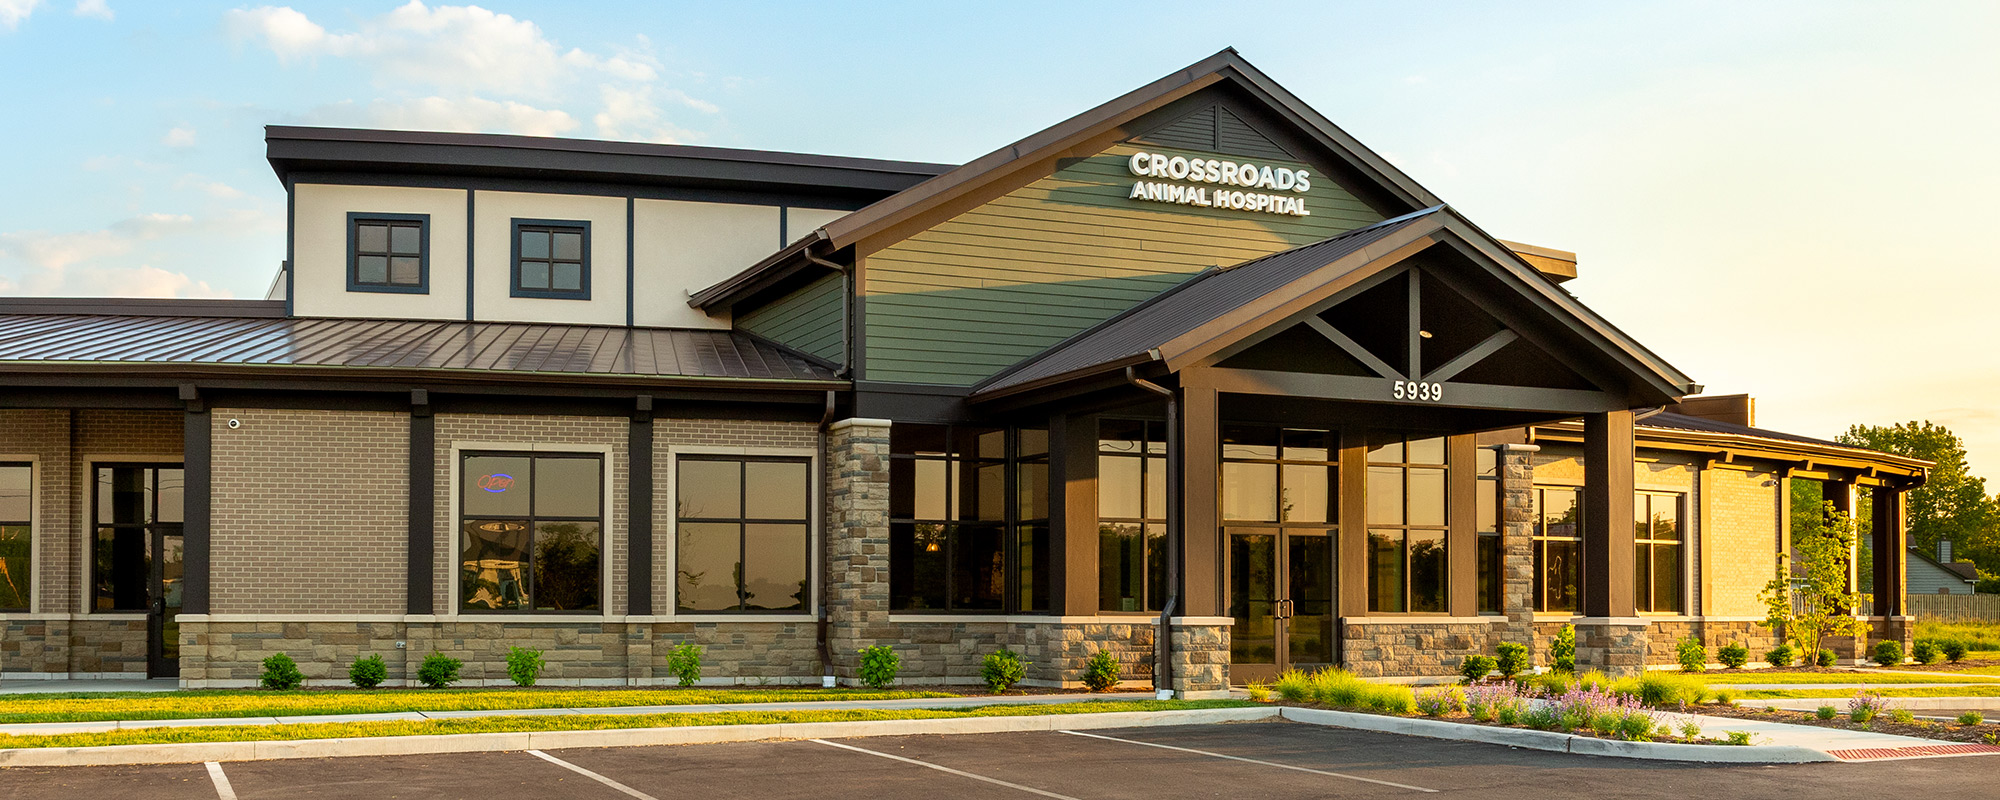 Crossroads Animal Hospital office building